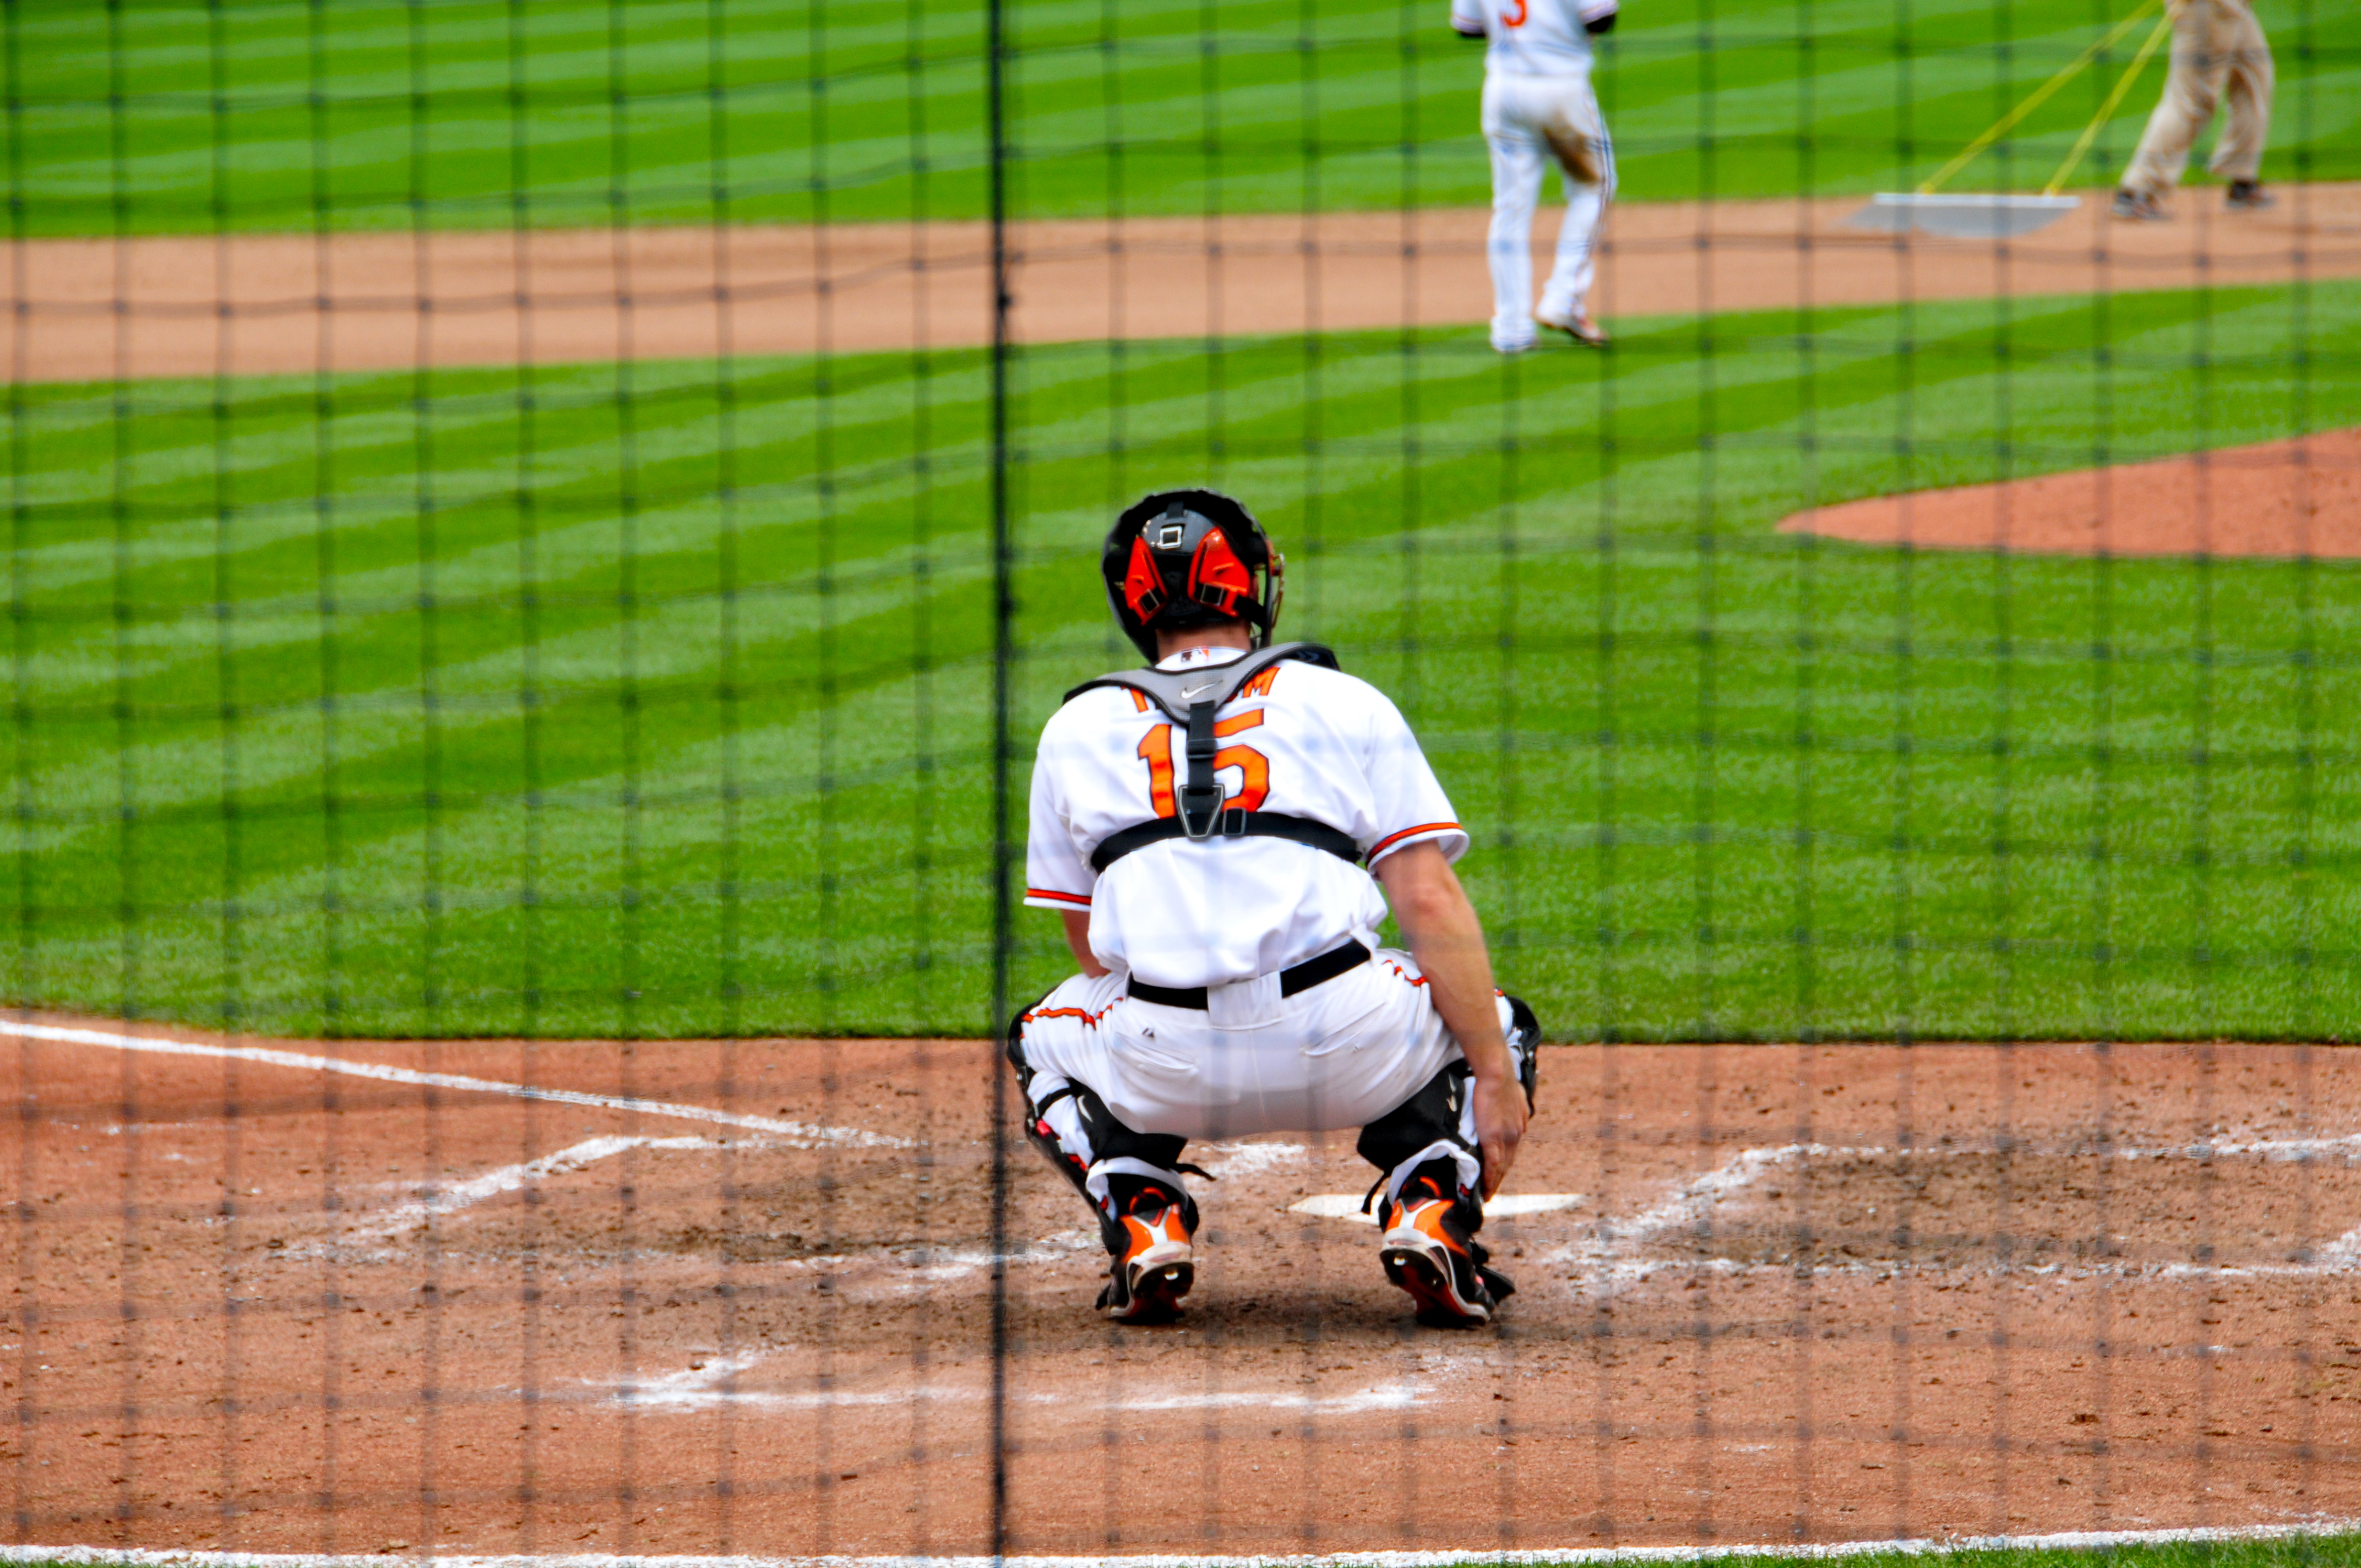 Description baseball catcher jpg